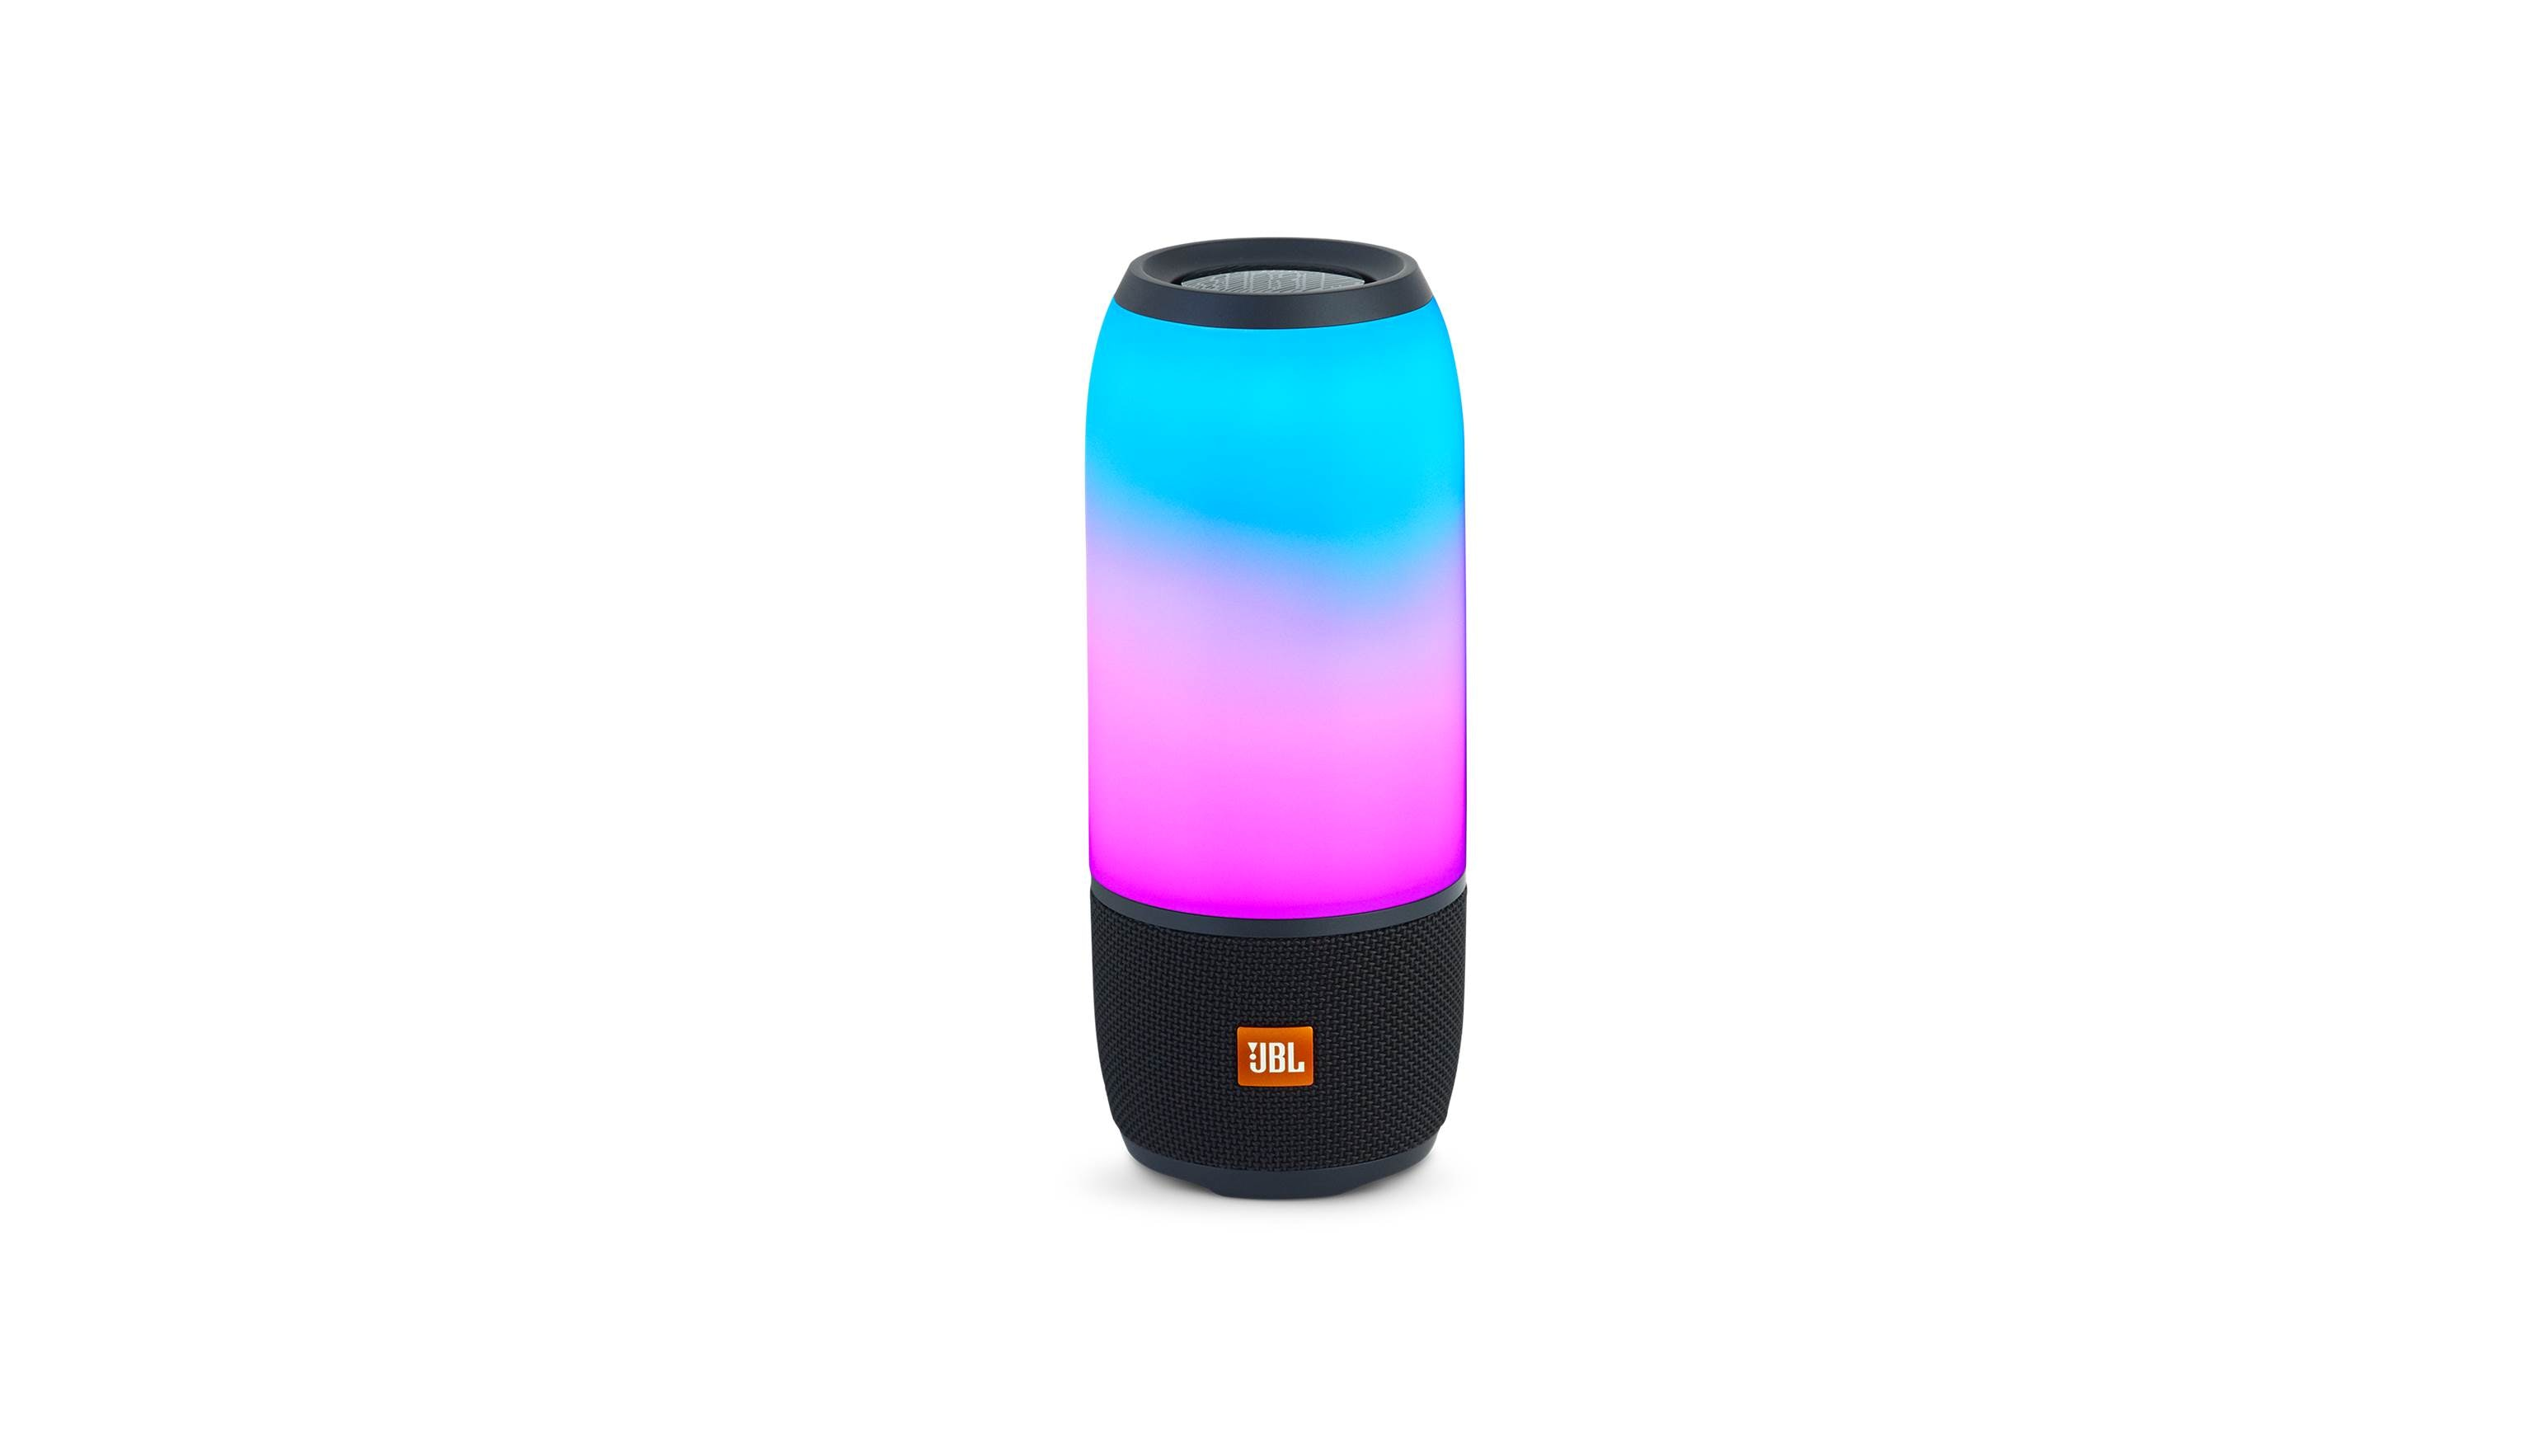 JBL Pulse 3 Wireless Portable Bluetooth Speaker - Black ... Jbl Portable Speakers Light Up